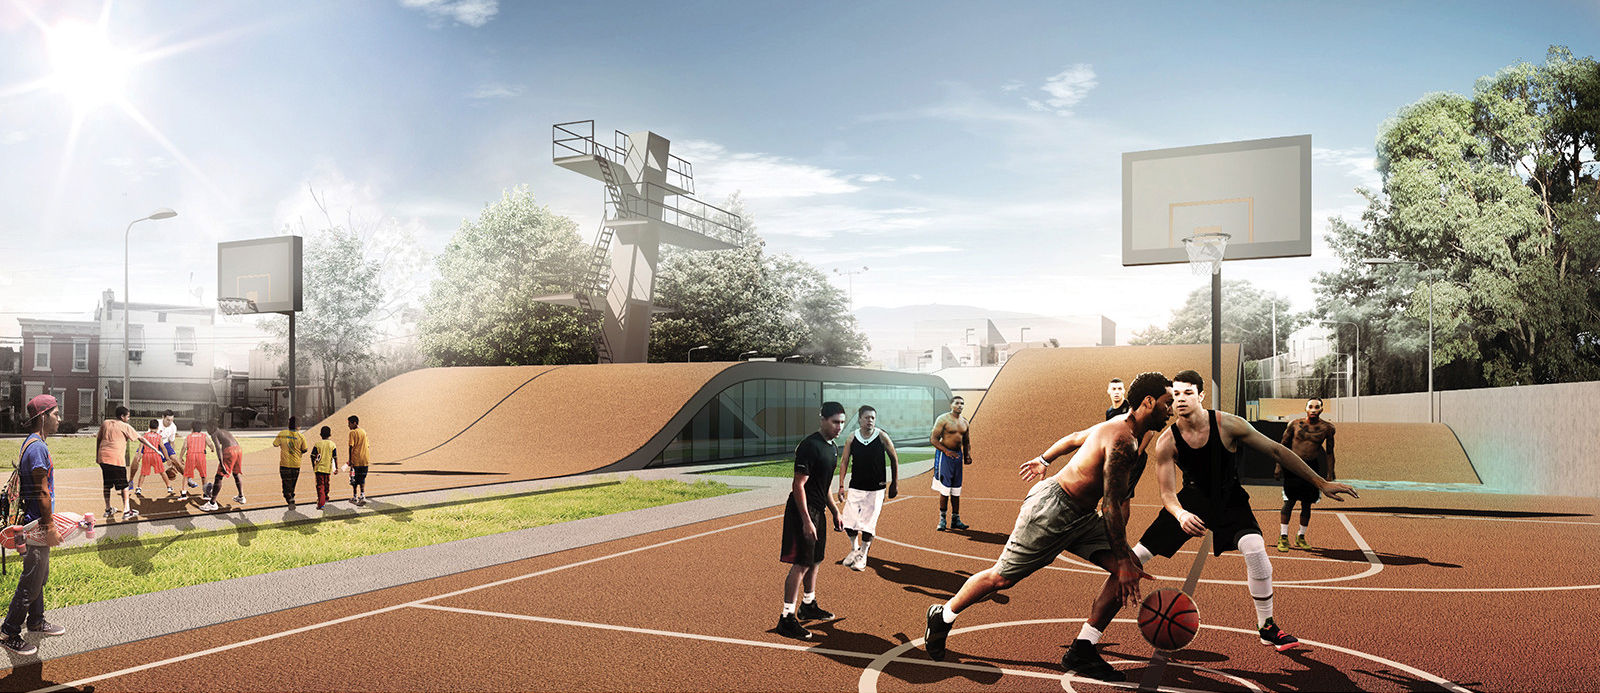 MJZ-Philadelphia-Waterloo-Recreation-Center (3)